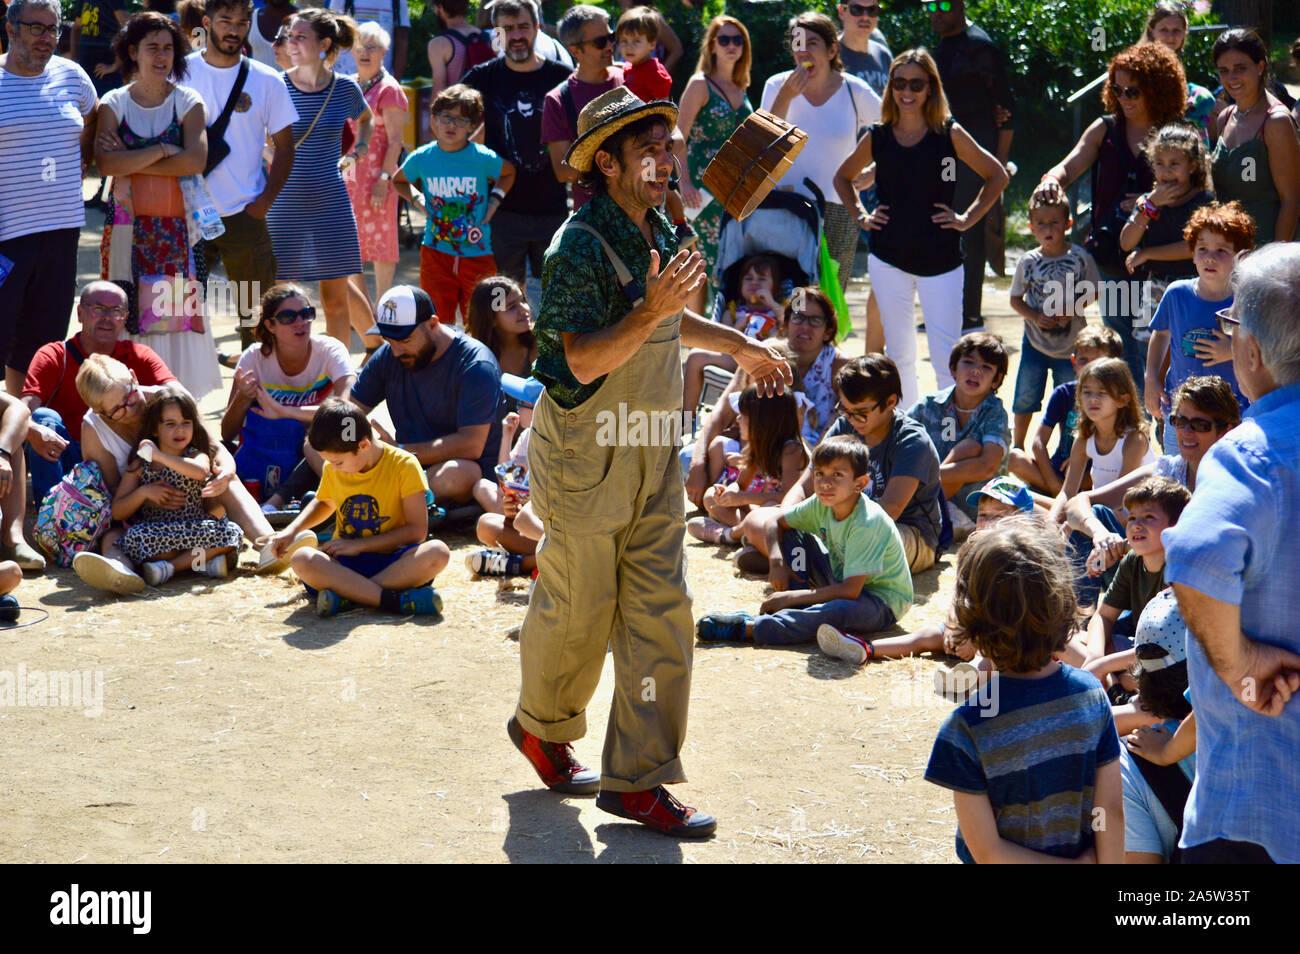 Kids watching a street performer at Ciutadella Park during La Merce 2019 in Barcelona, Spain Stock Photo